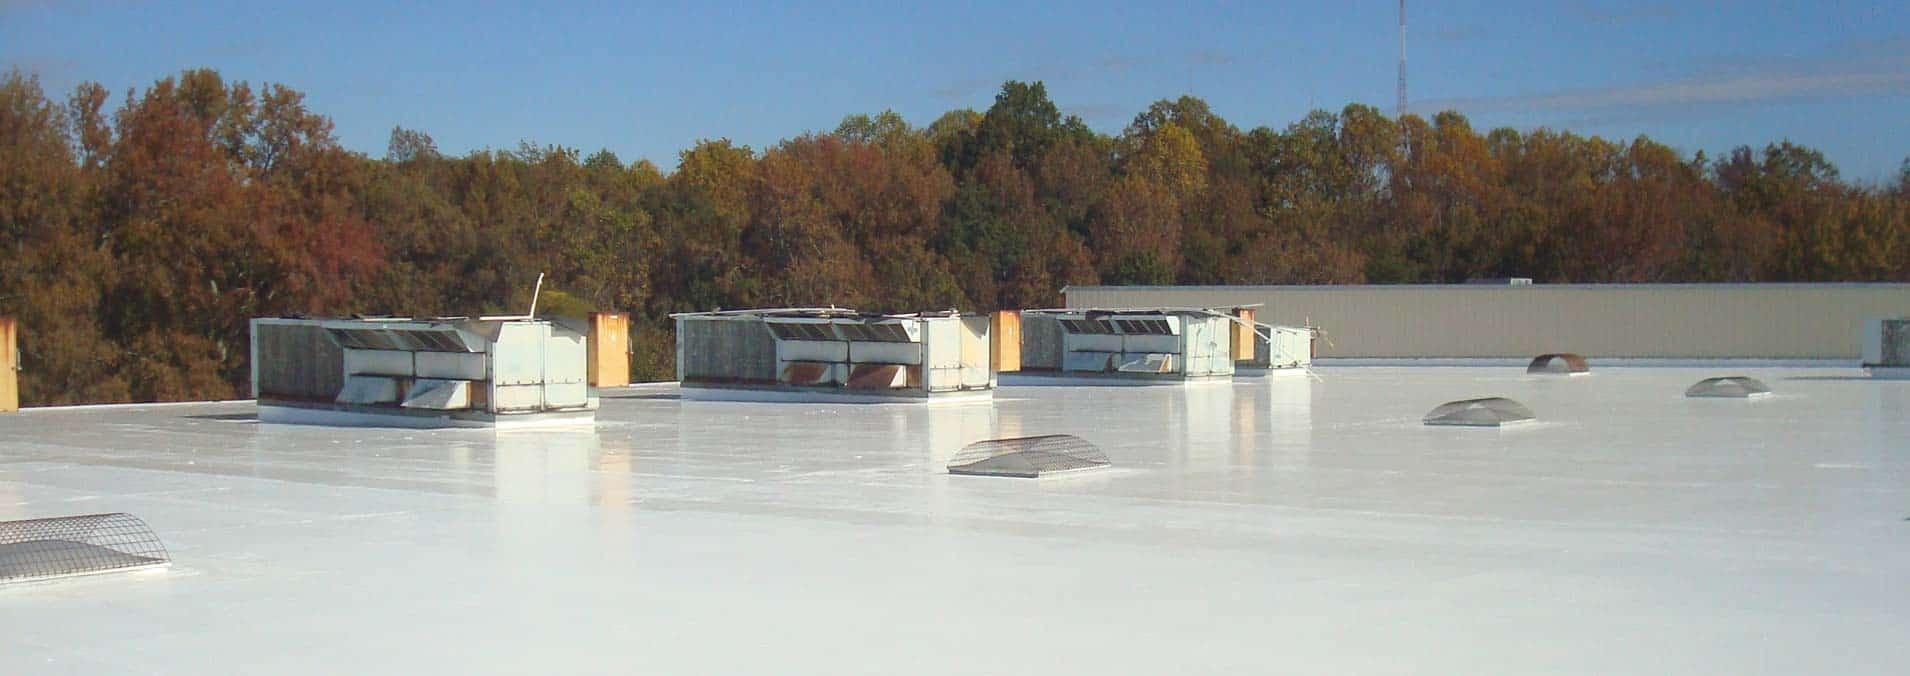 Elastomeric Roof Coatings Atlanta | Commercial Roof Repair